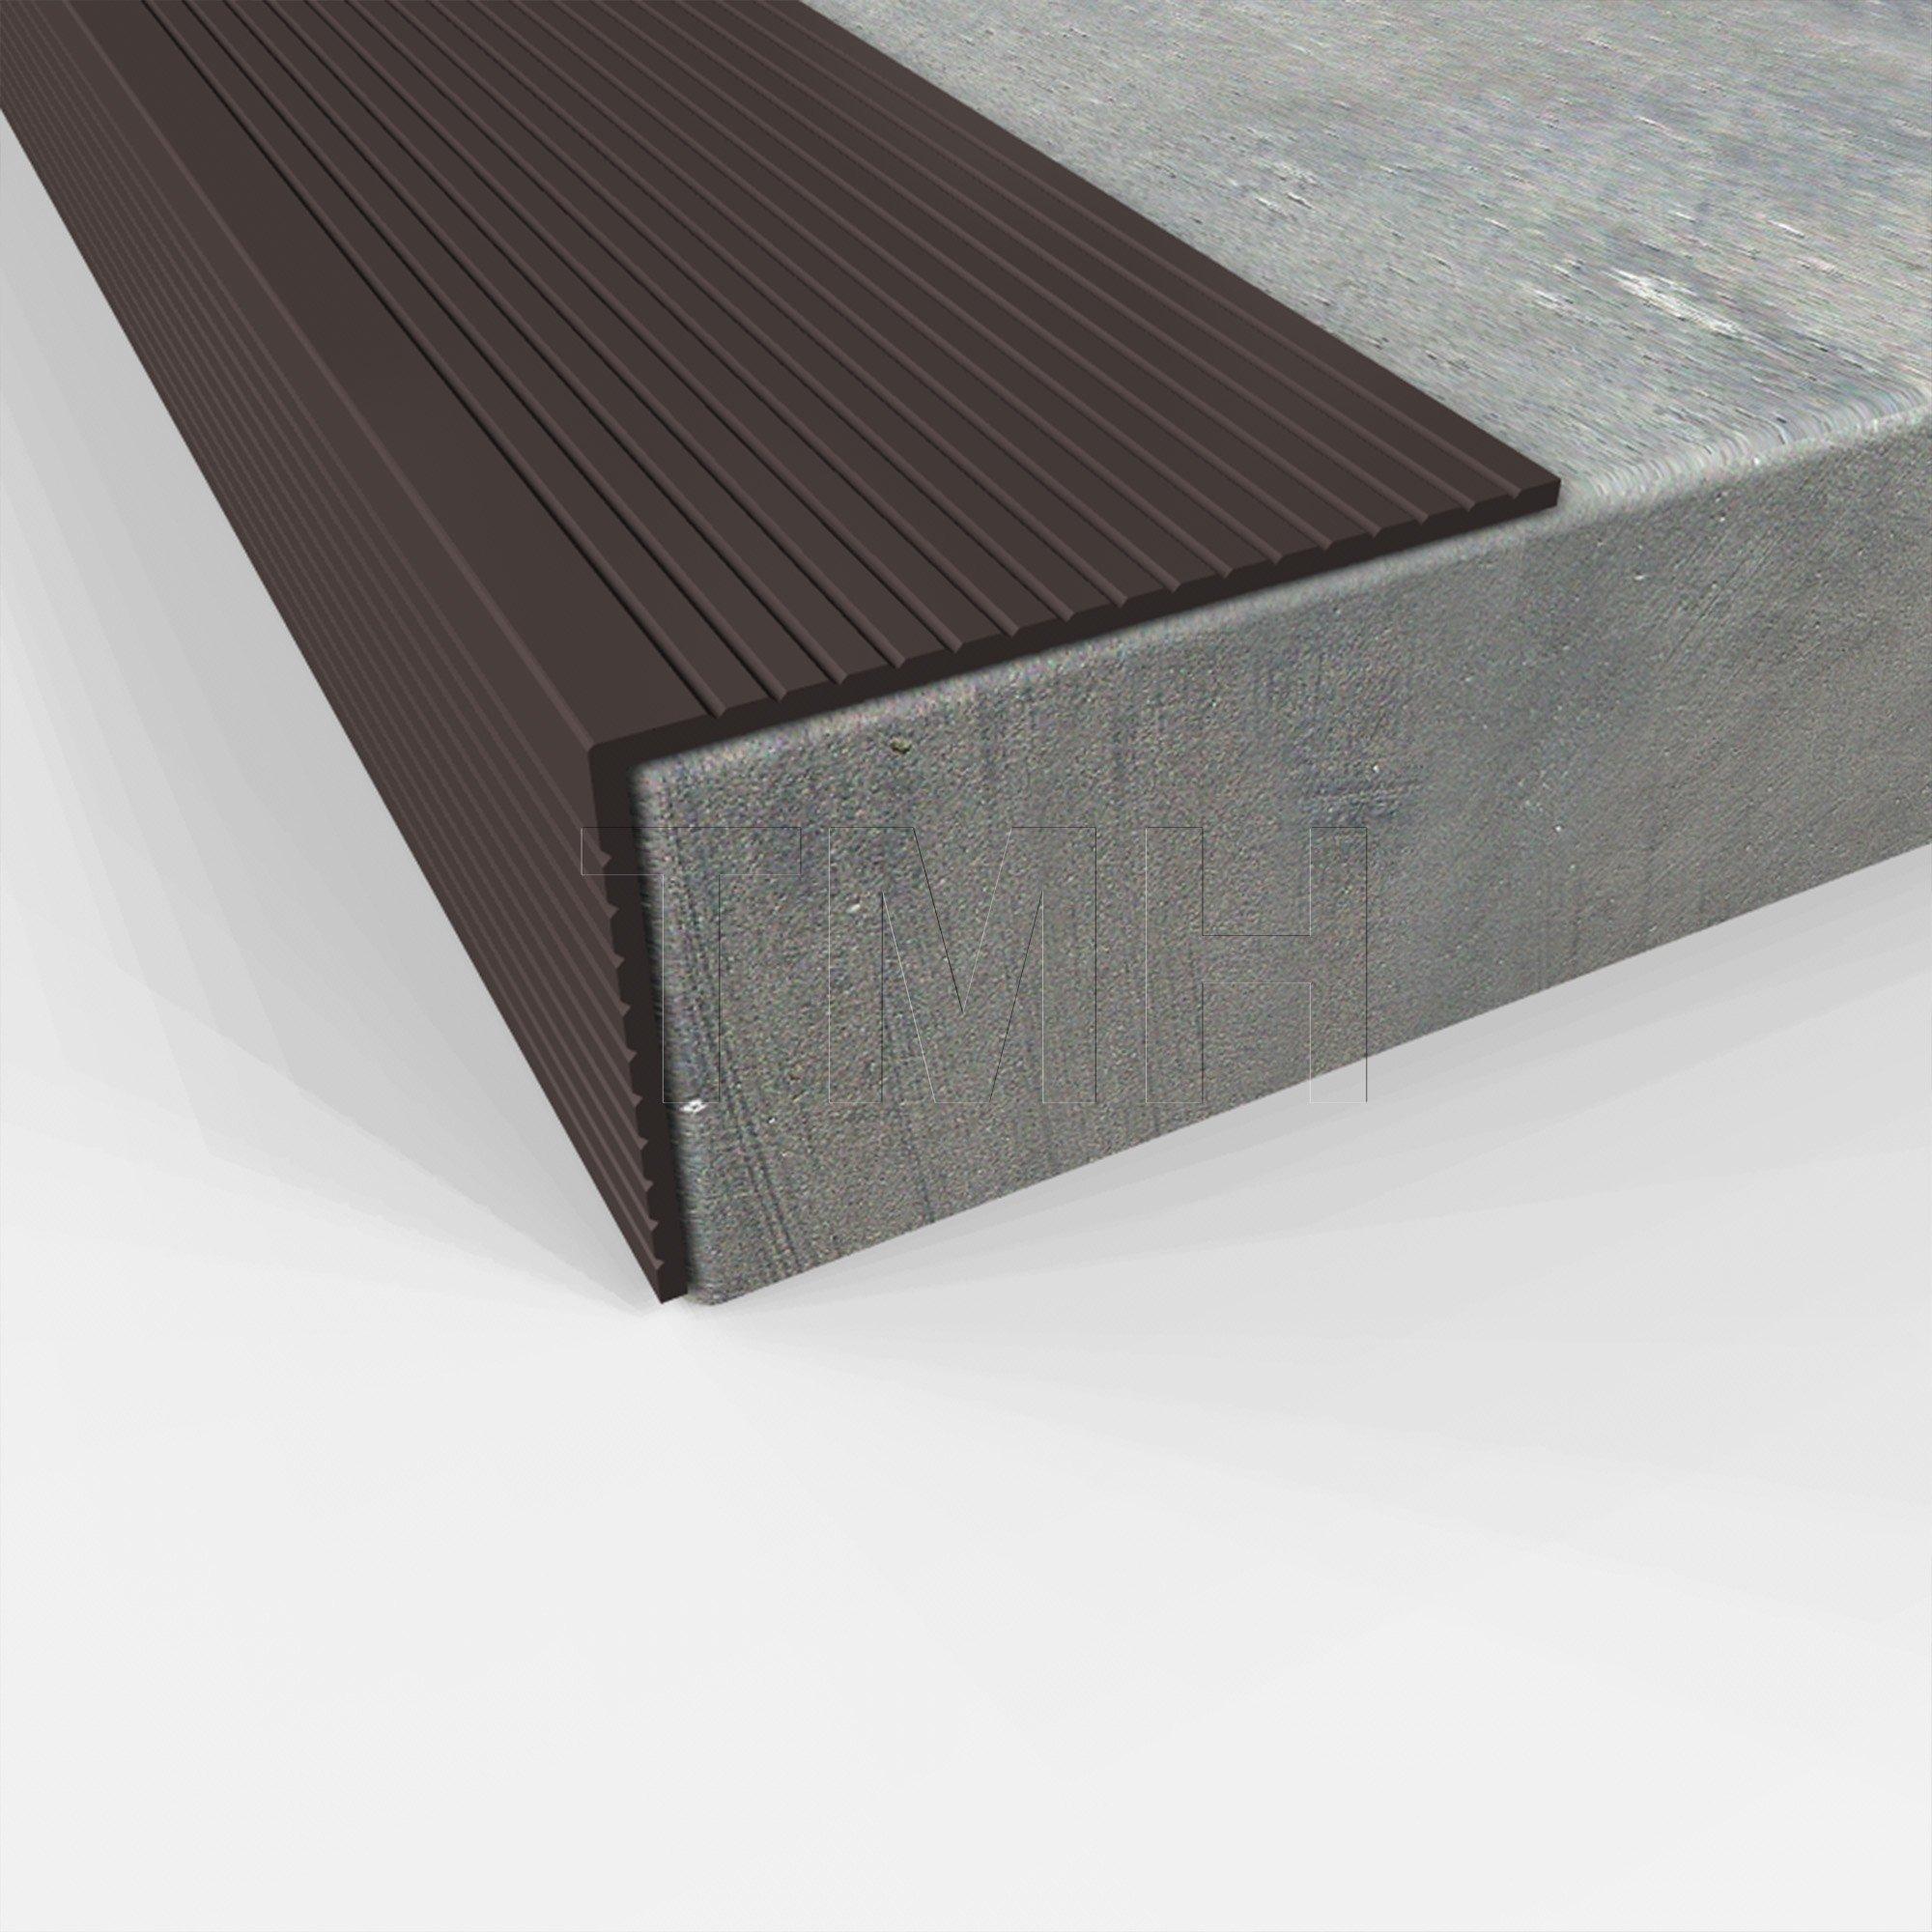 Stair Nosing, 48'' Long, Dark Bronze Aluminum Anodized (Black)